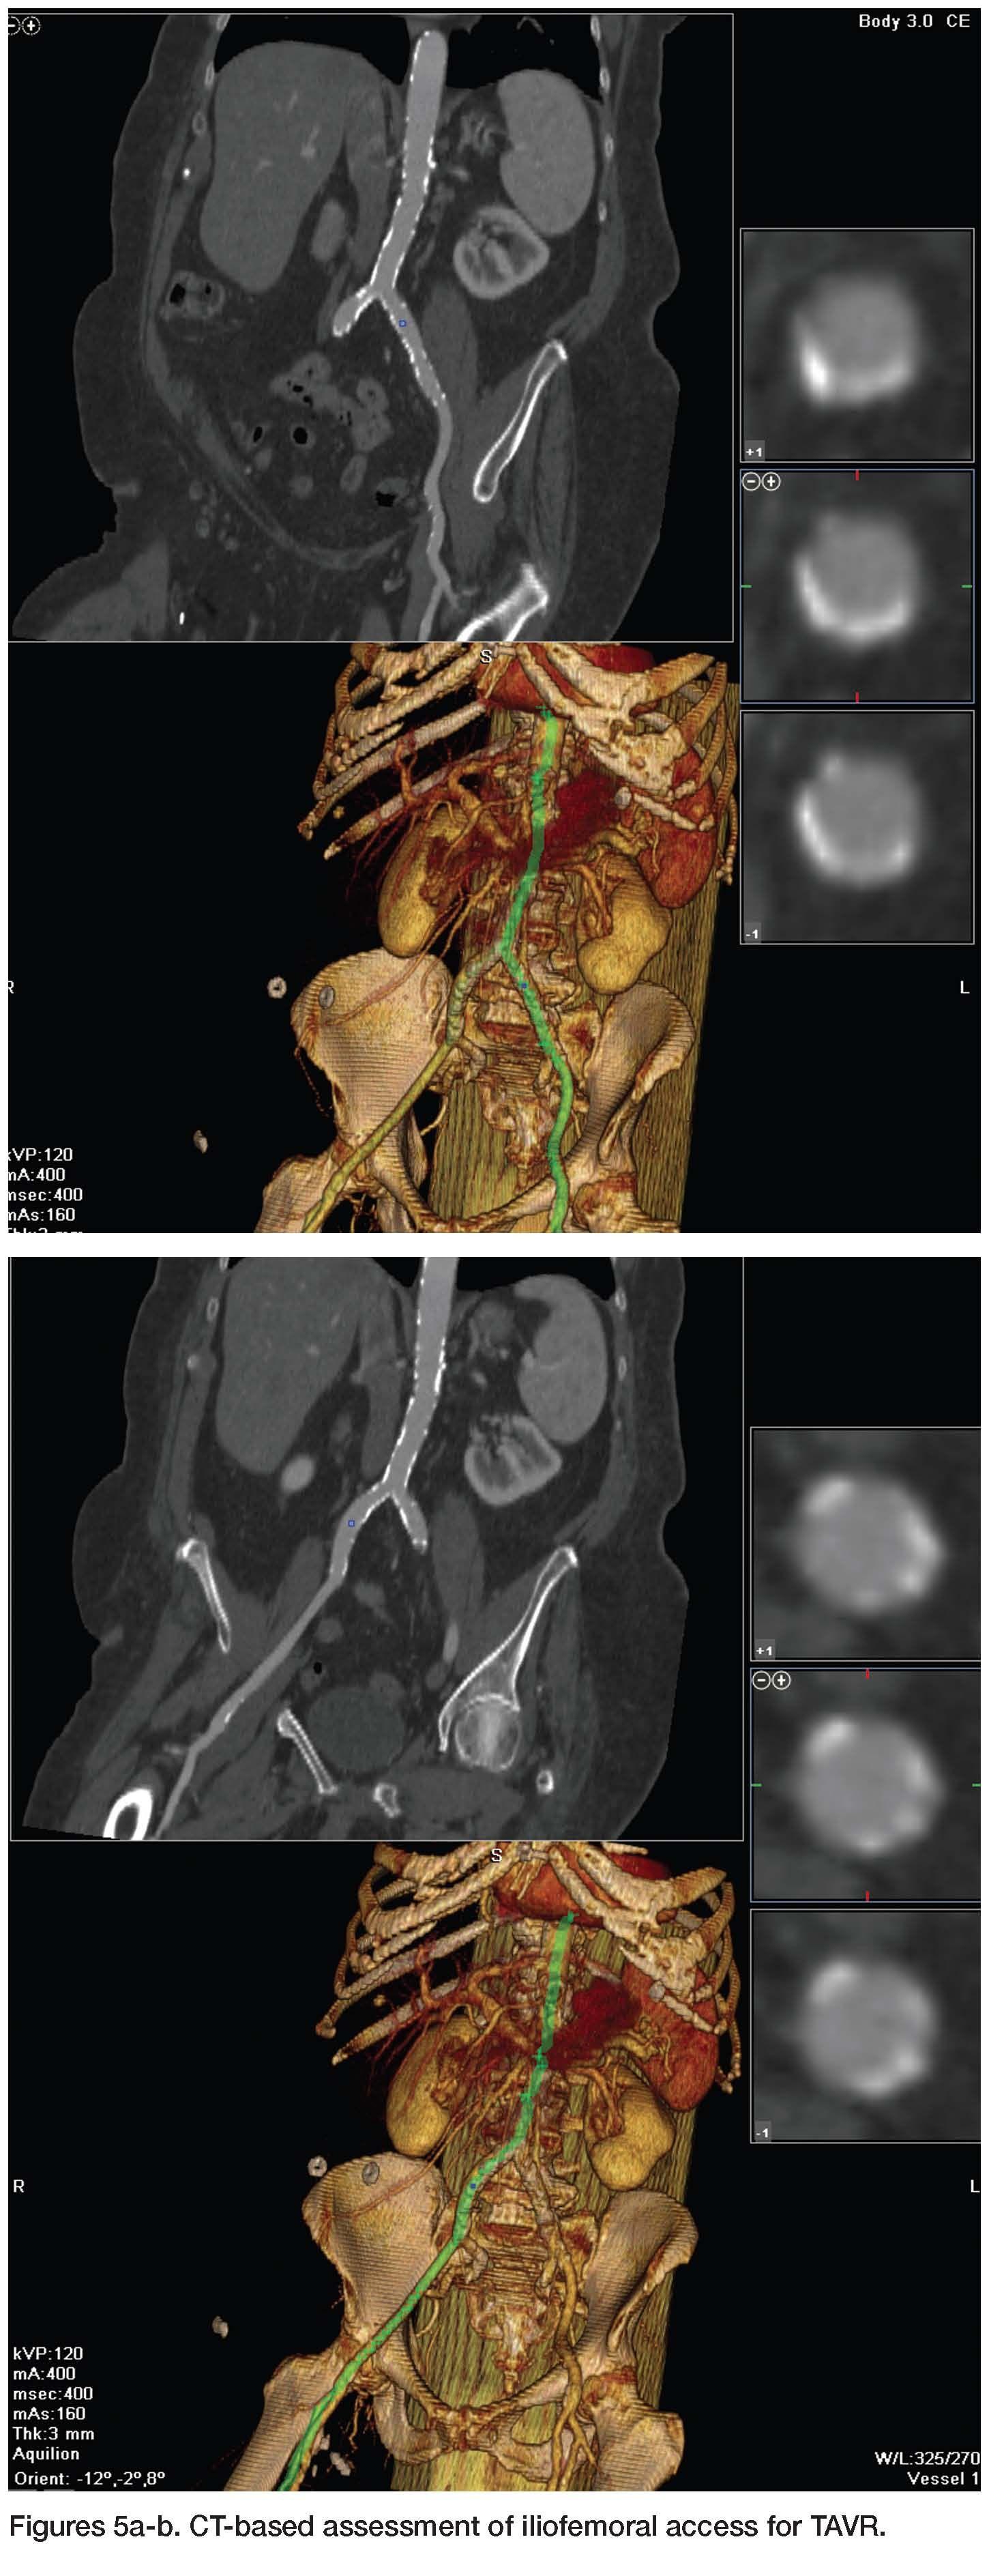 Pin on cardiac catheter laboratory ccl nursing